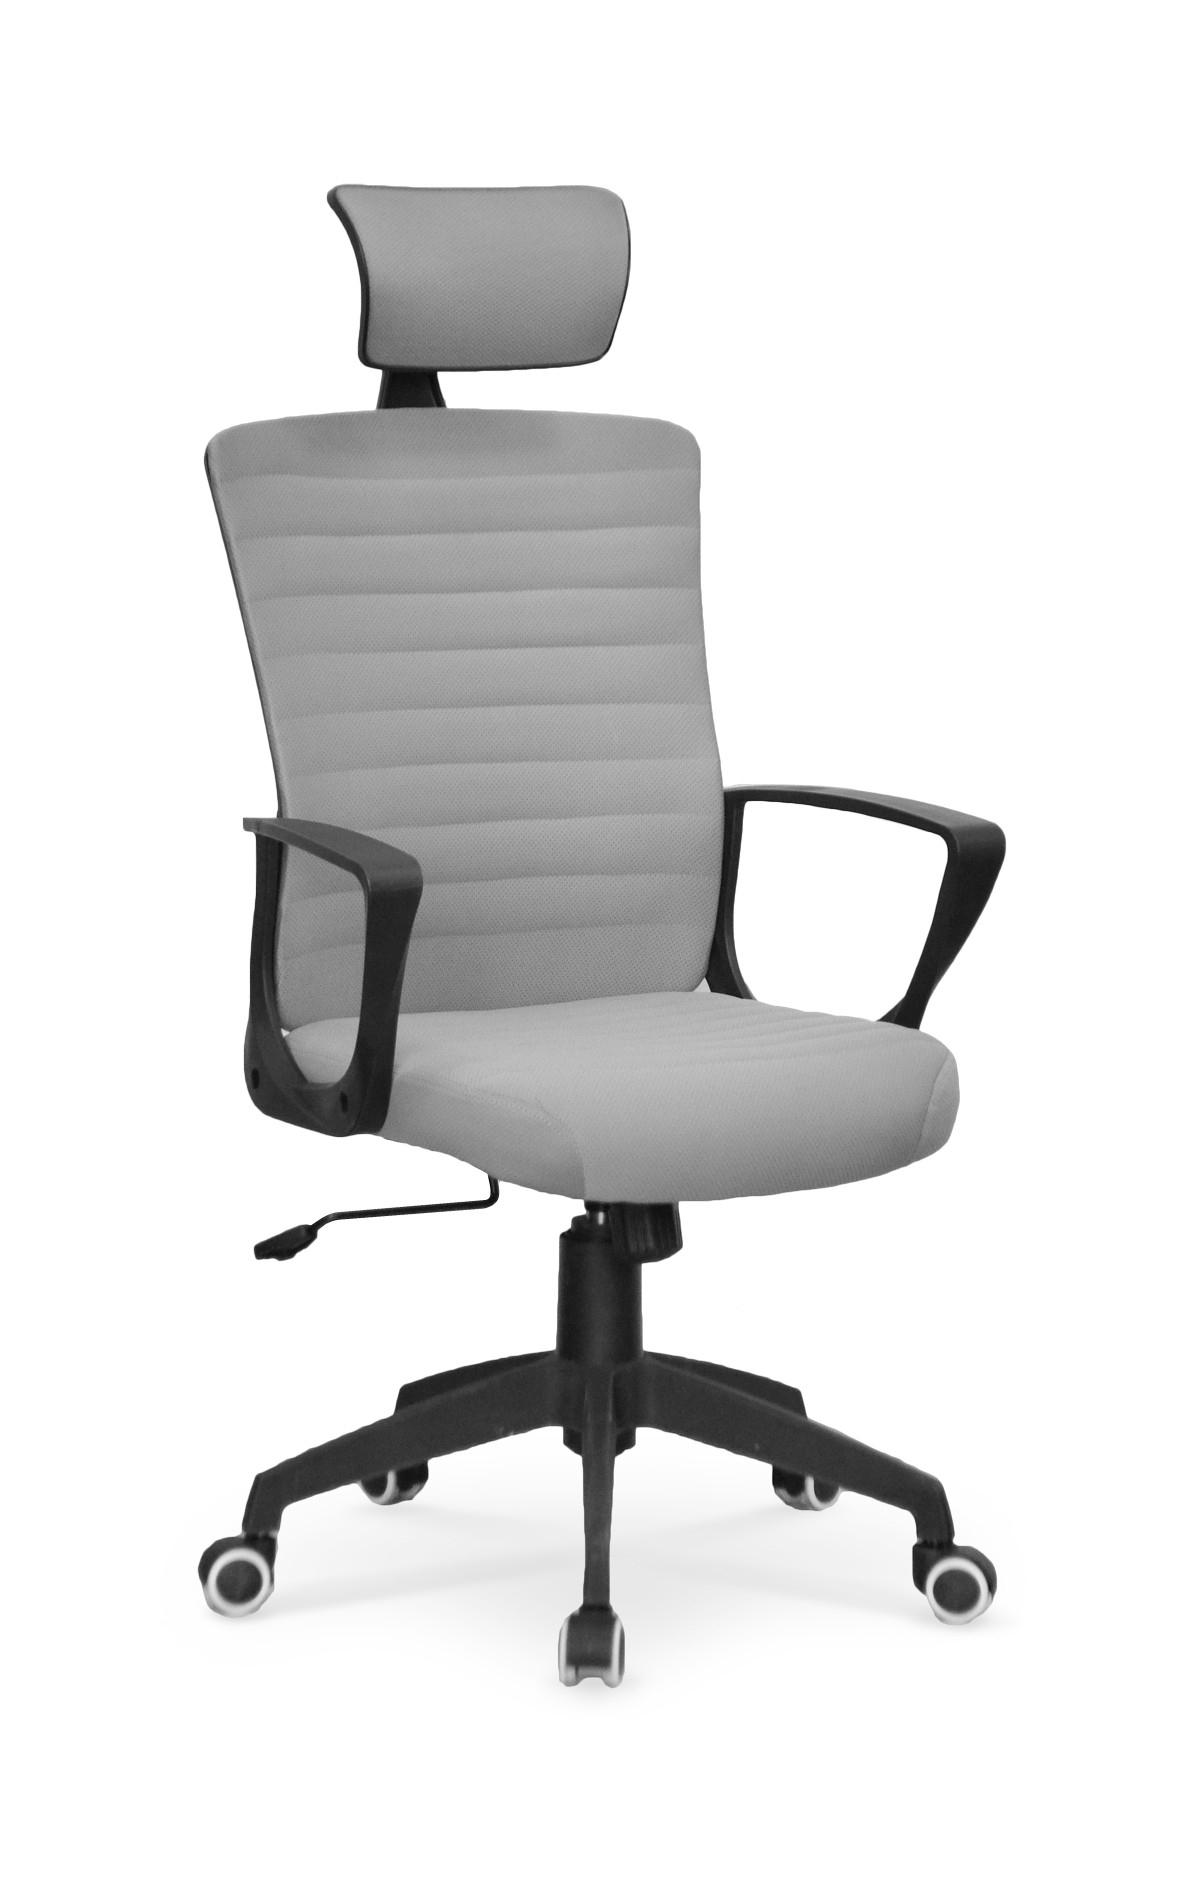 Scaun de birou ergonomic, tapitat cu piele ecologica Bender Gri, l59xA62xH124-134 cm poza